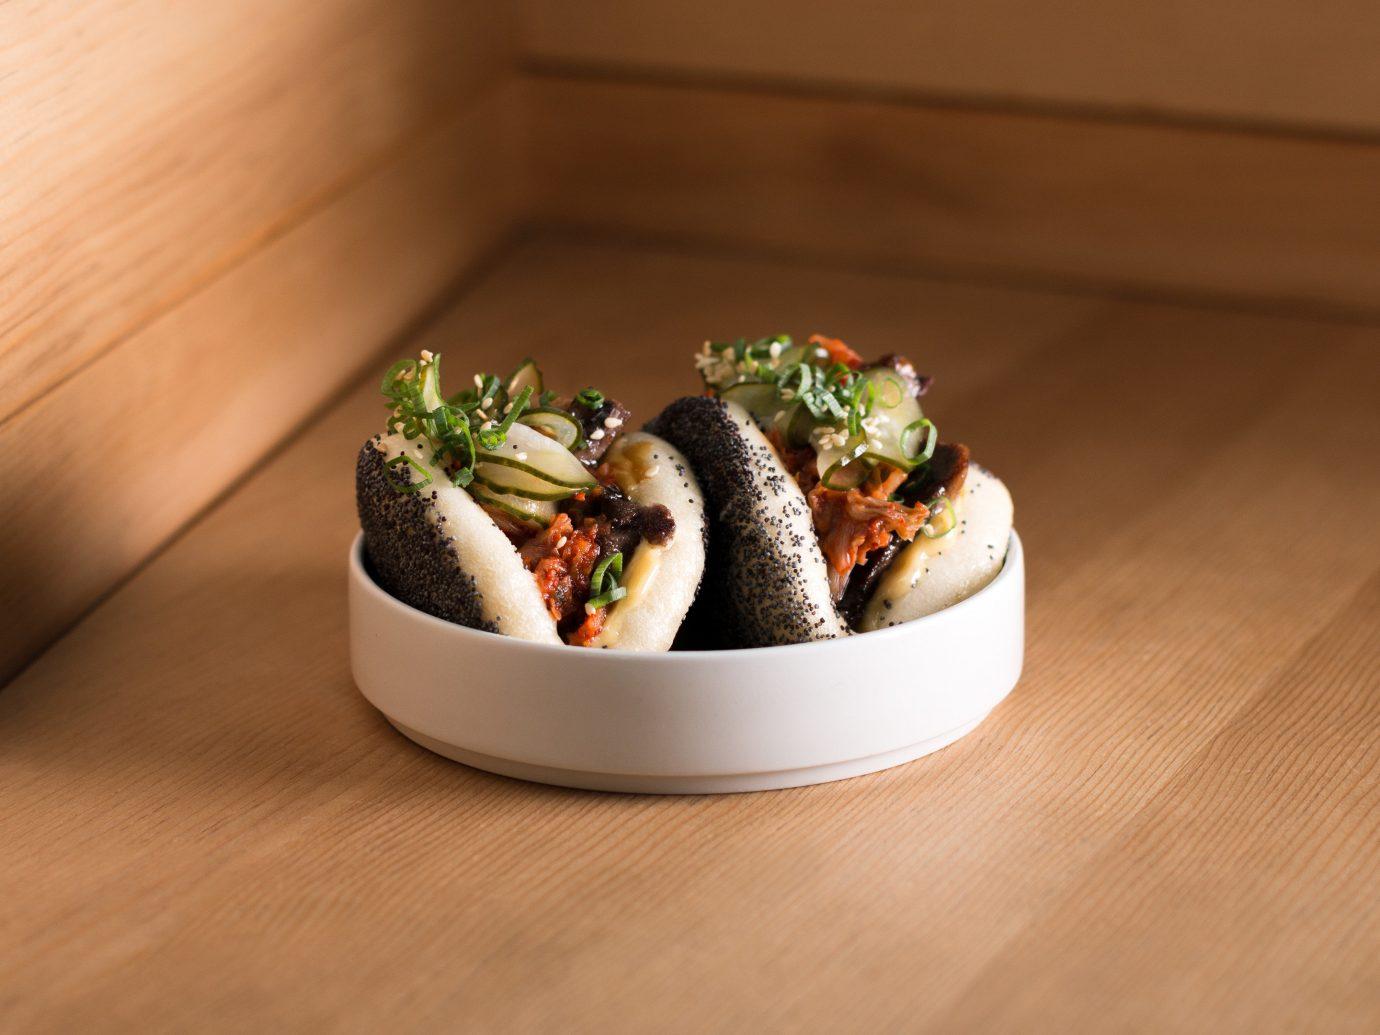 Food + Drink Travel Tips table indoor dish cuisine food appetizer japanese cuisine wooden asian food meal comfort food finger food recipe vegetable